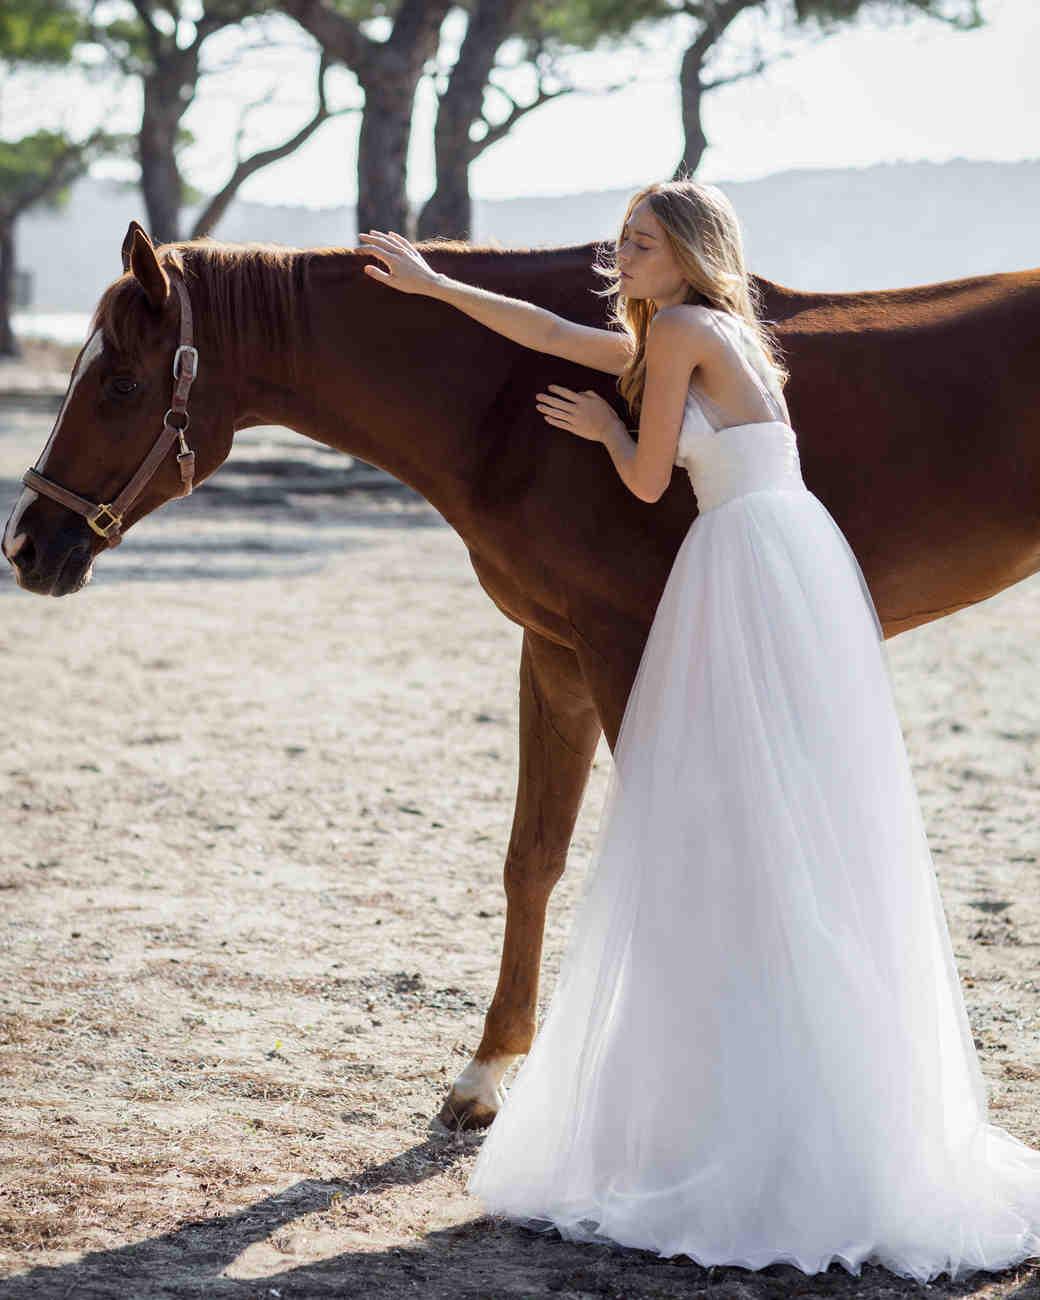 costarellos-fall2016-wedding-dress-16-10.jpg